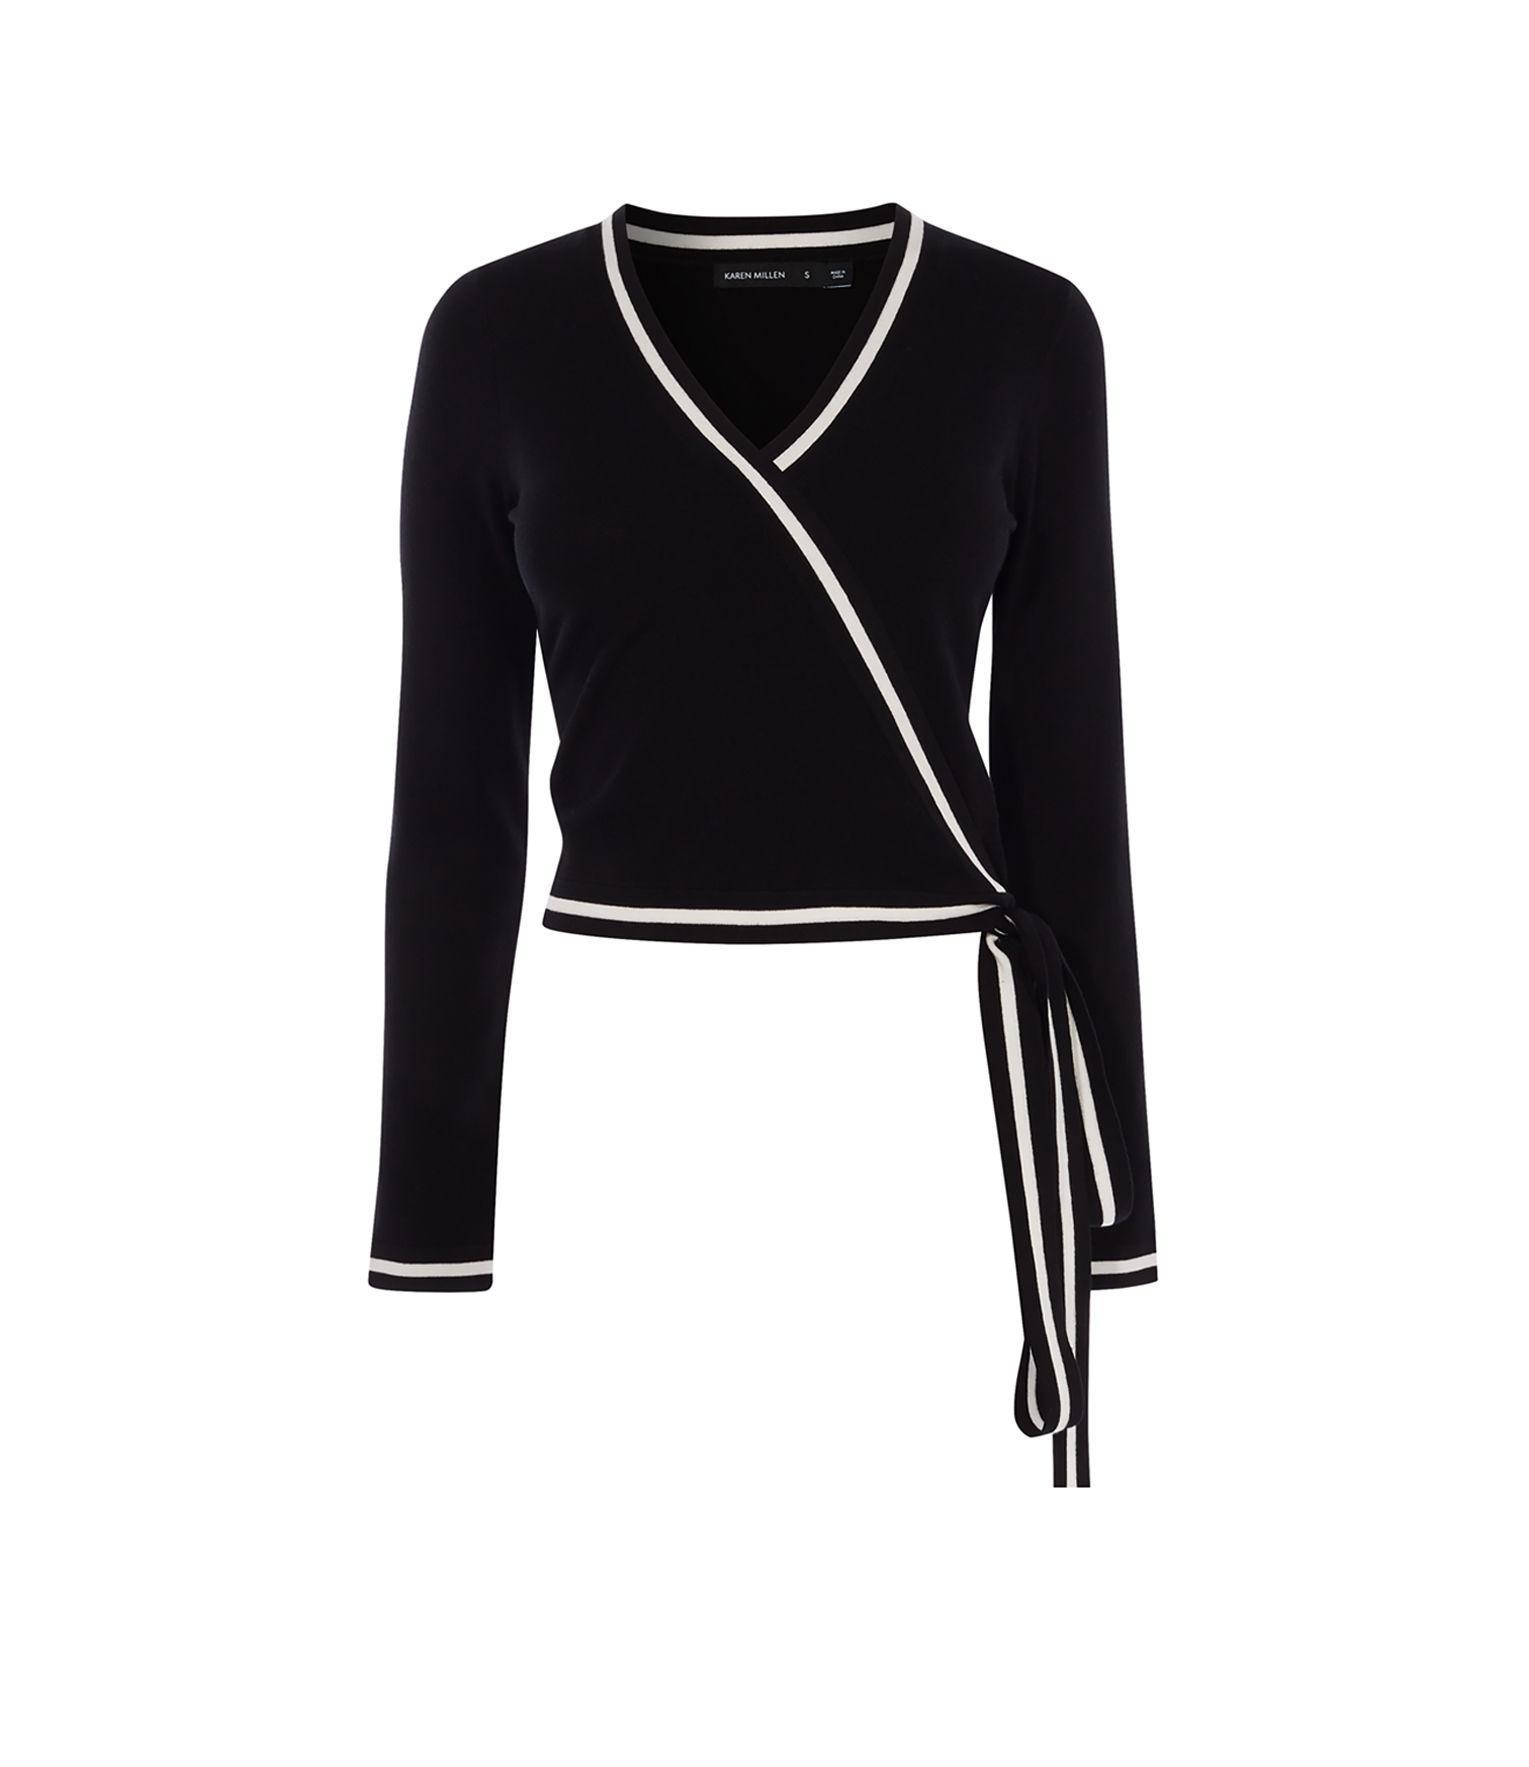 Lyst Karen Millen Wrap Knit Top In Black